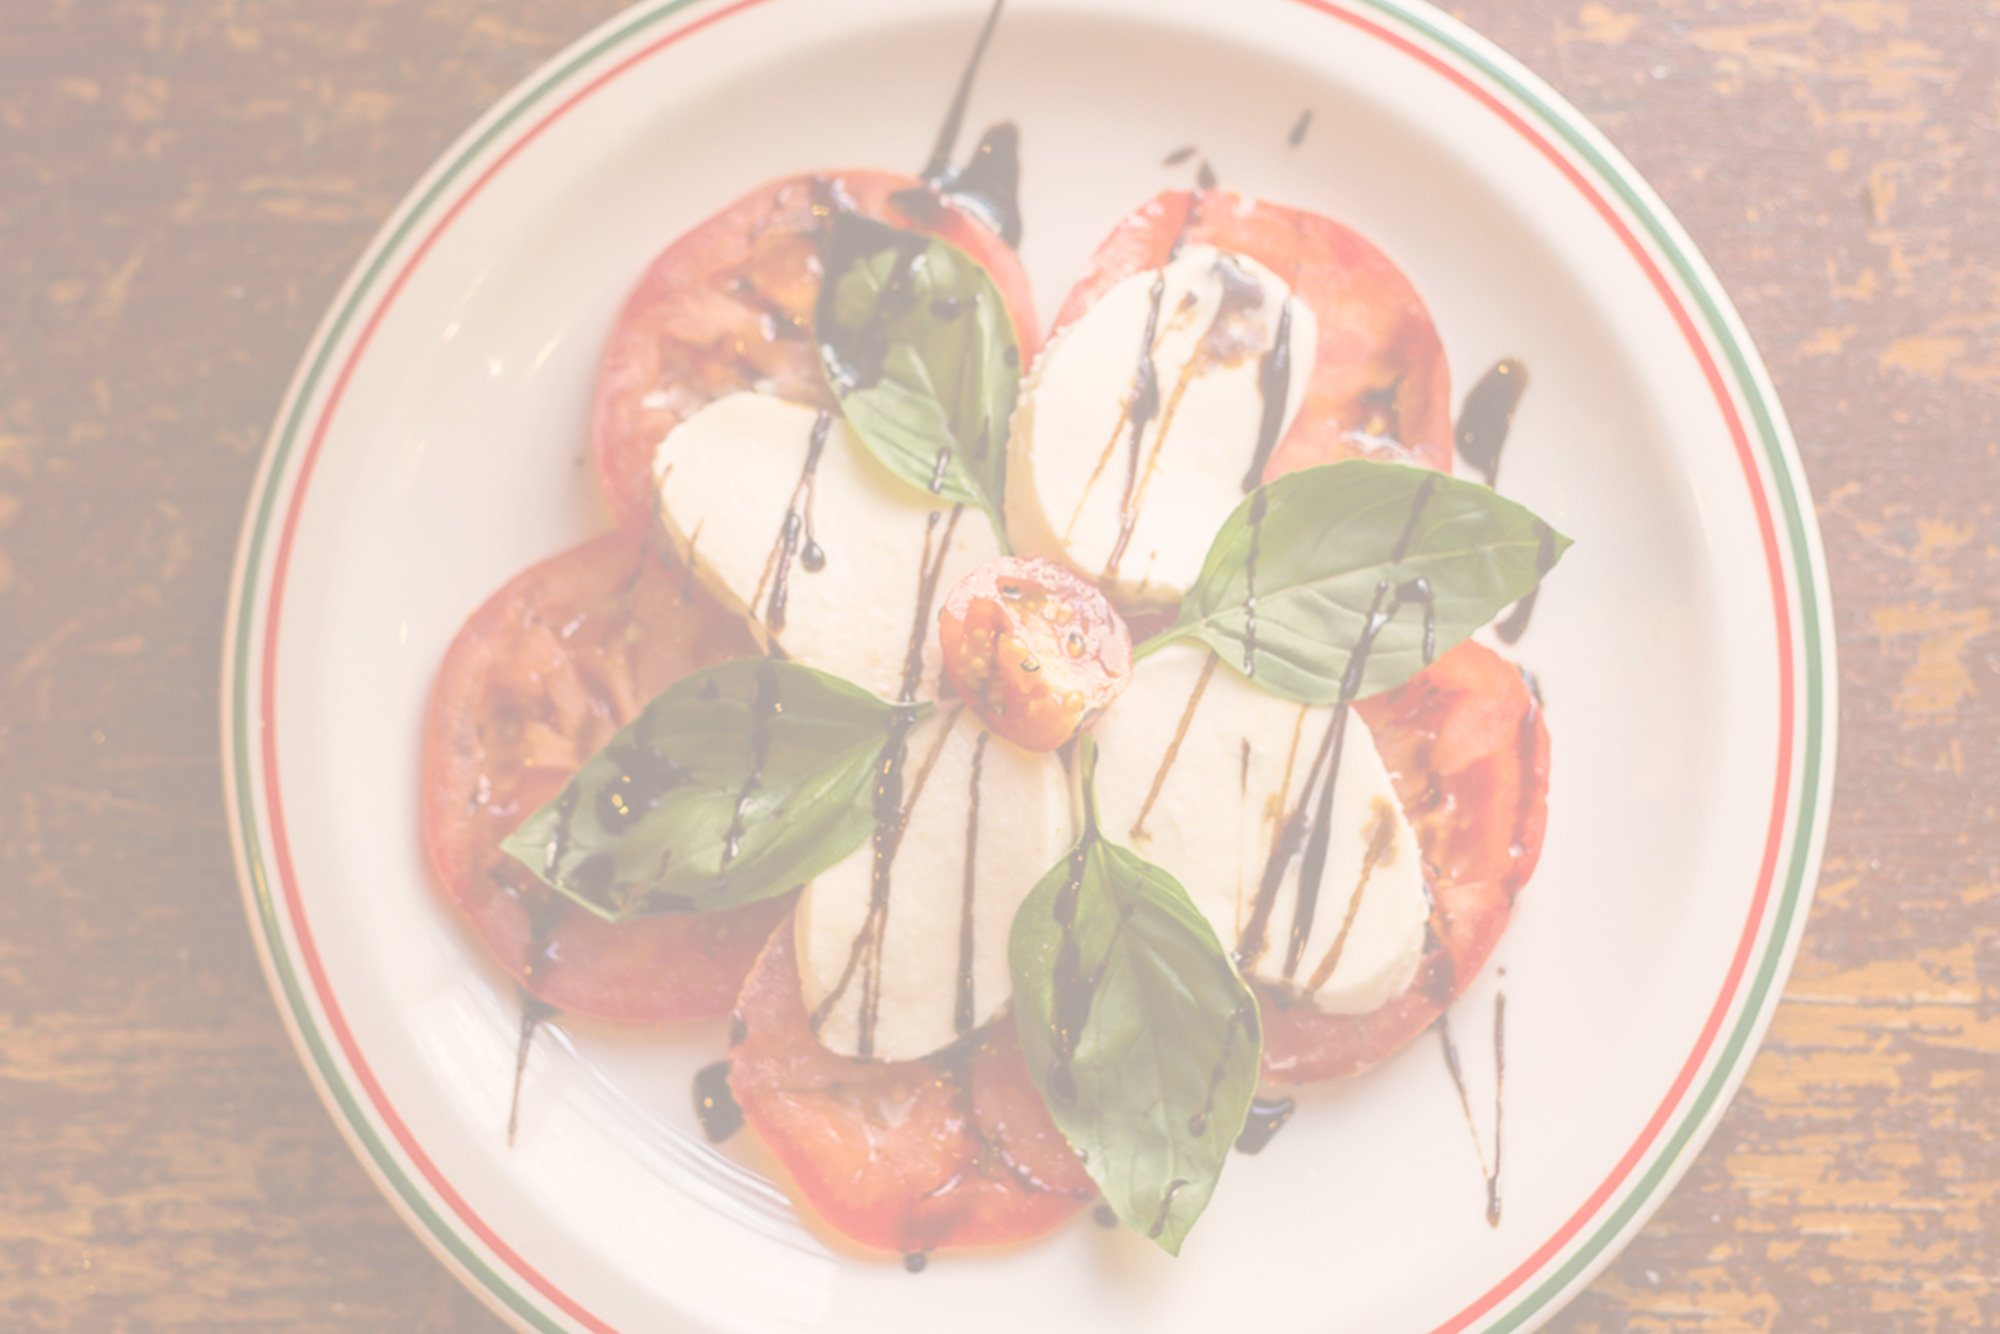 1 Best Local Italian Restaurant Liverpool - Villa Romana